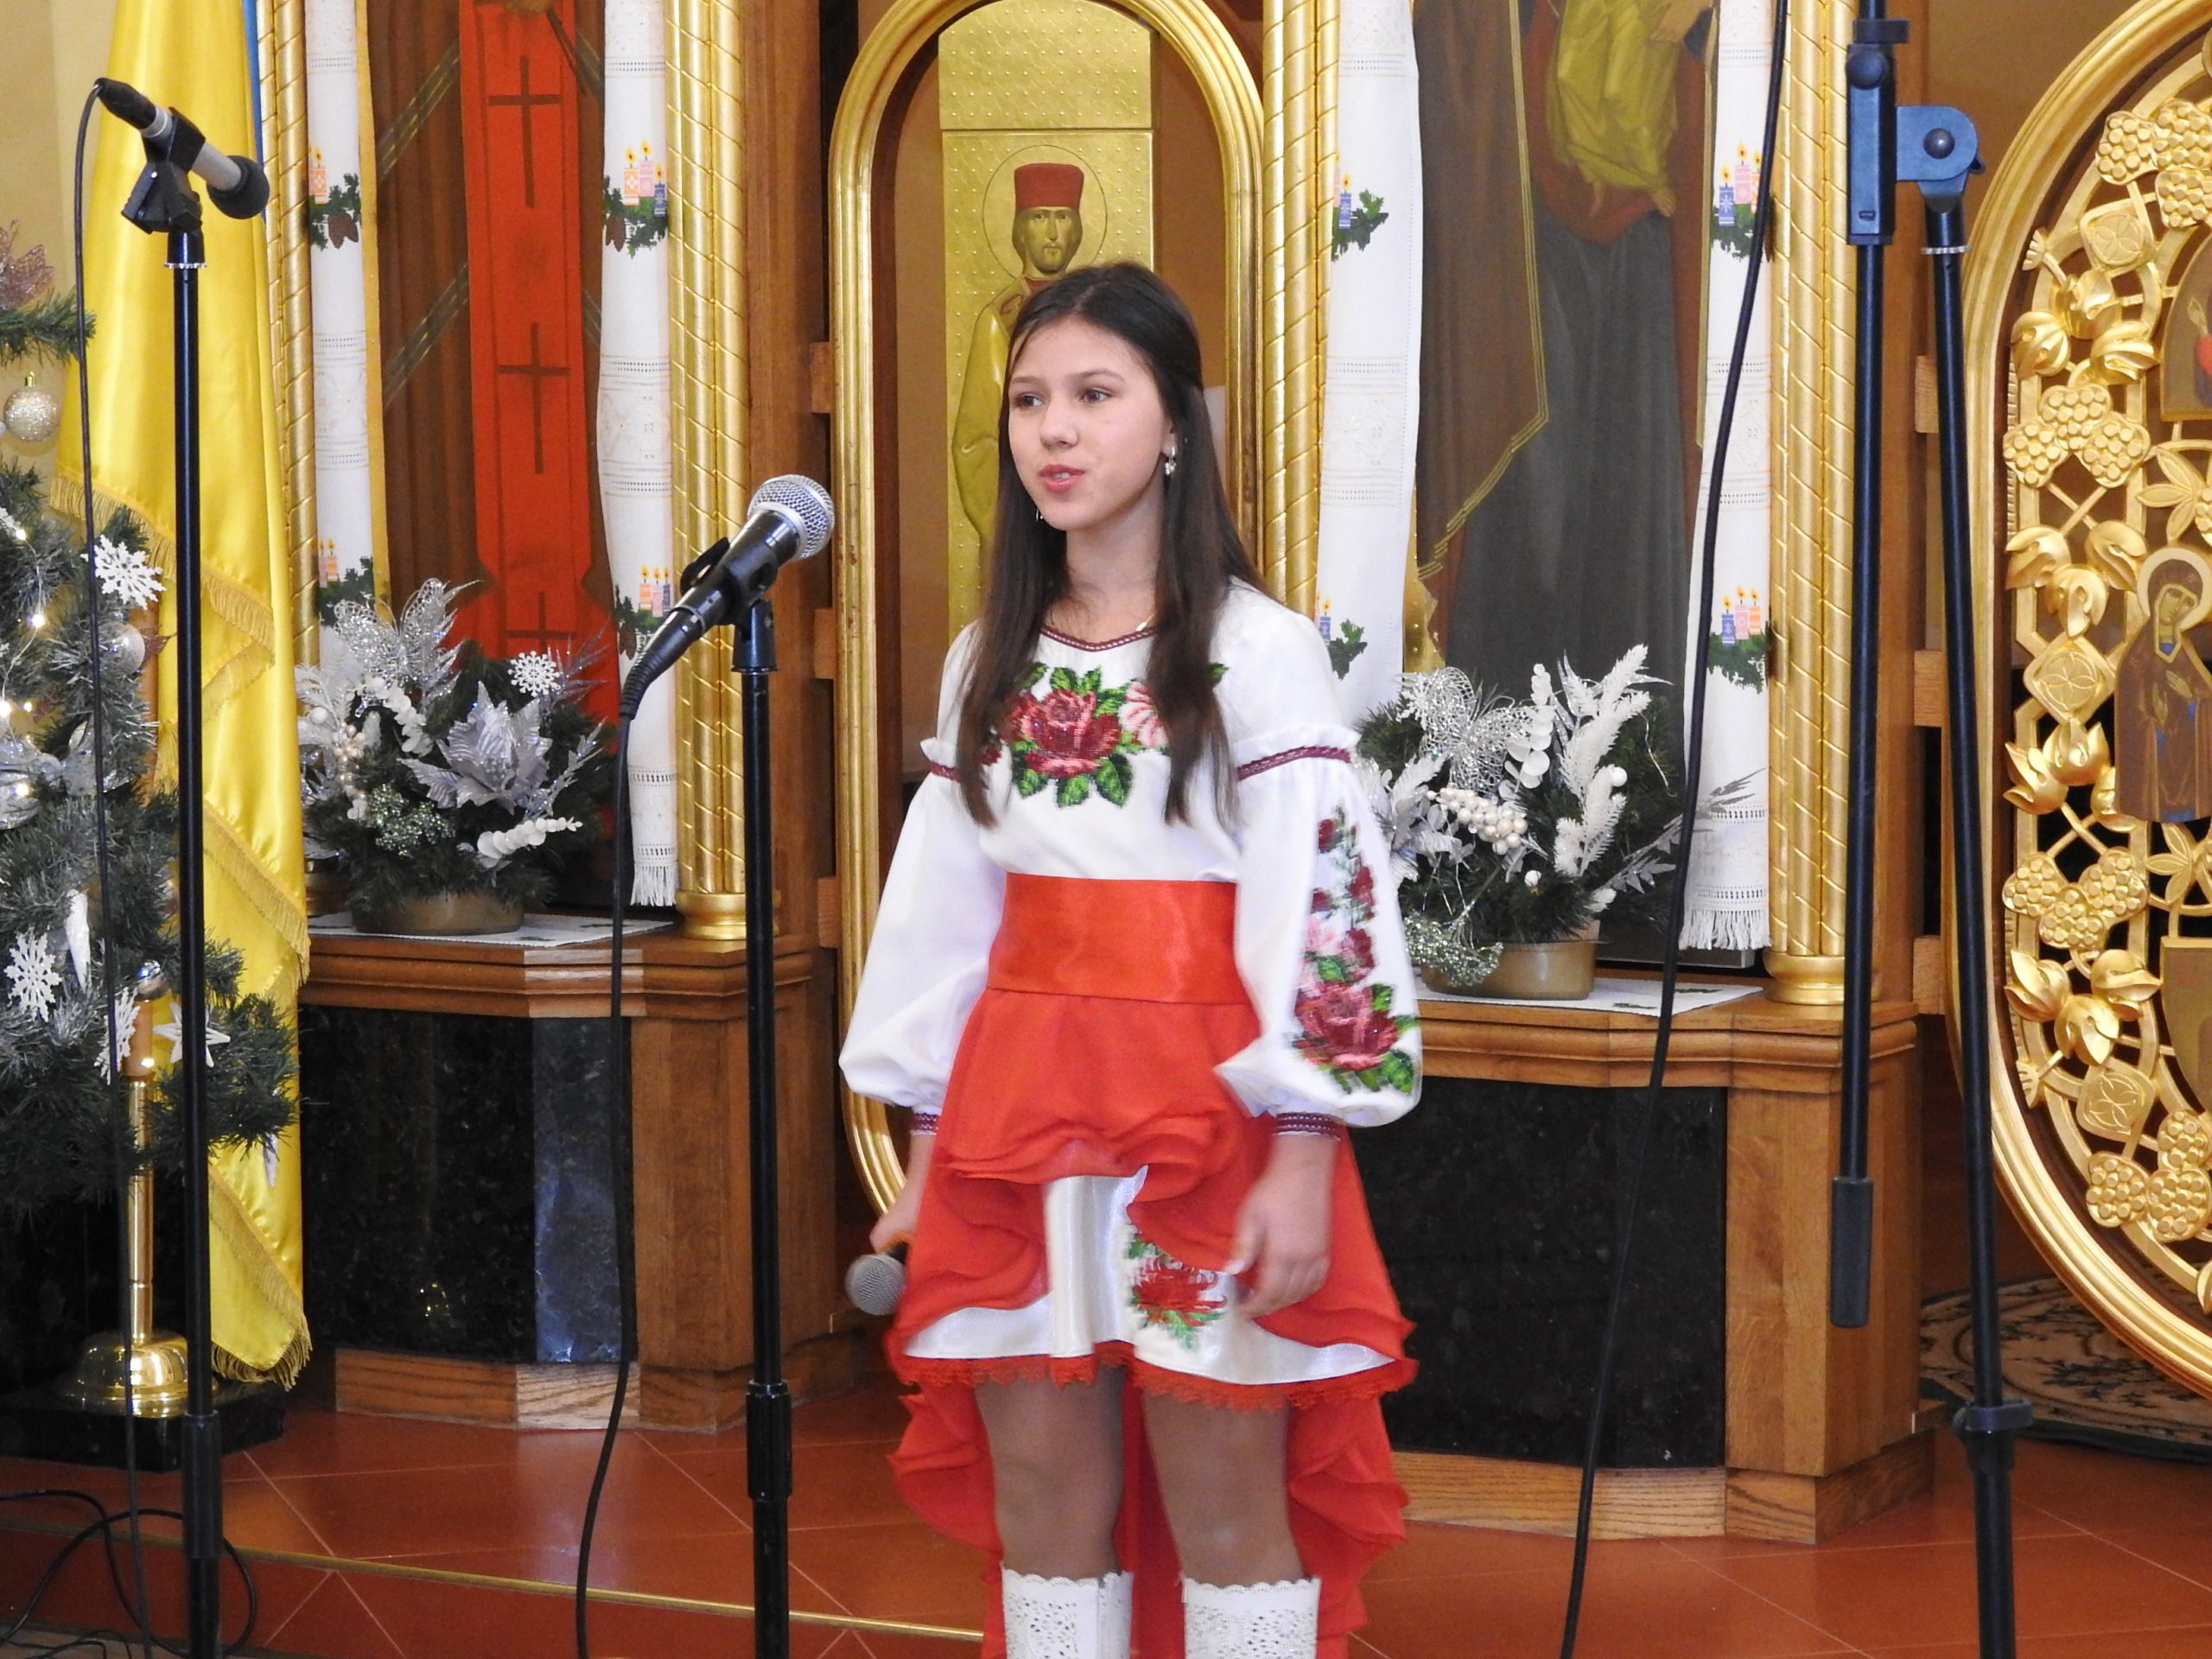 Марта Іващишин, с. Зимна Вода